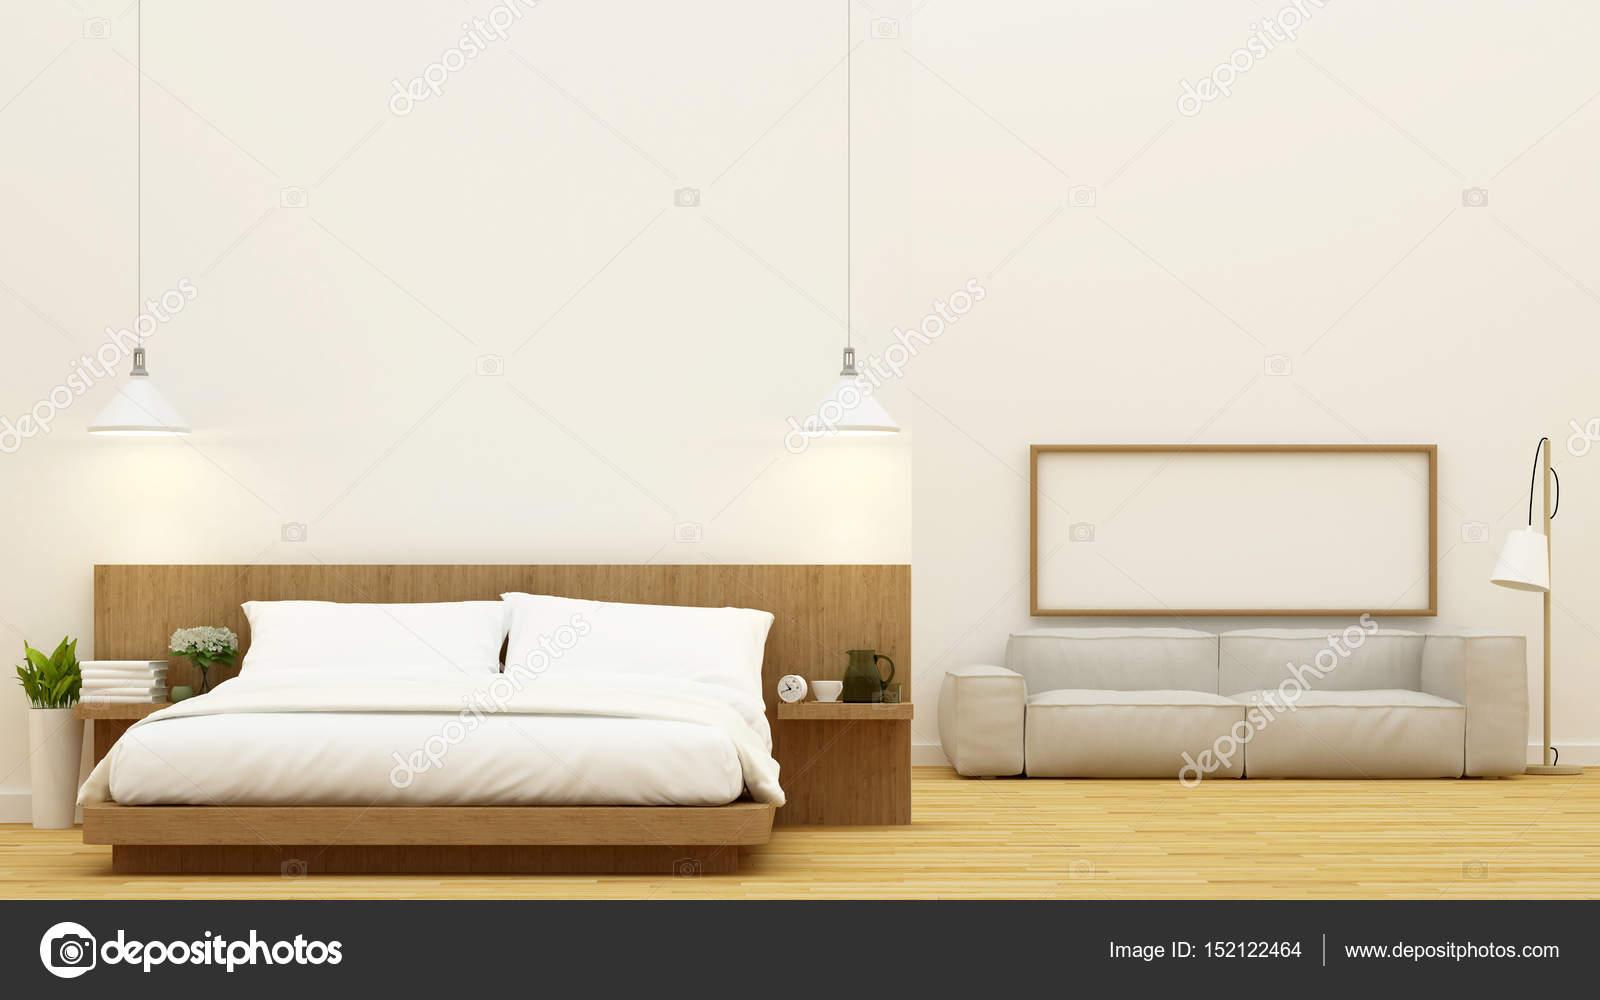 Slaapkamer en woonkamer schone ontwerp d rendering u stockfoto